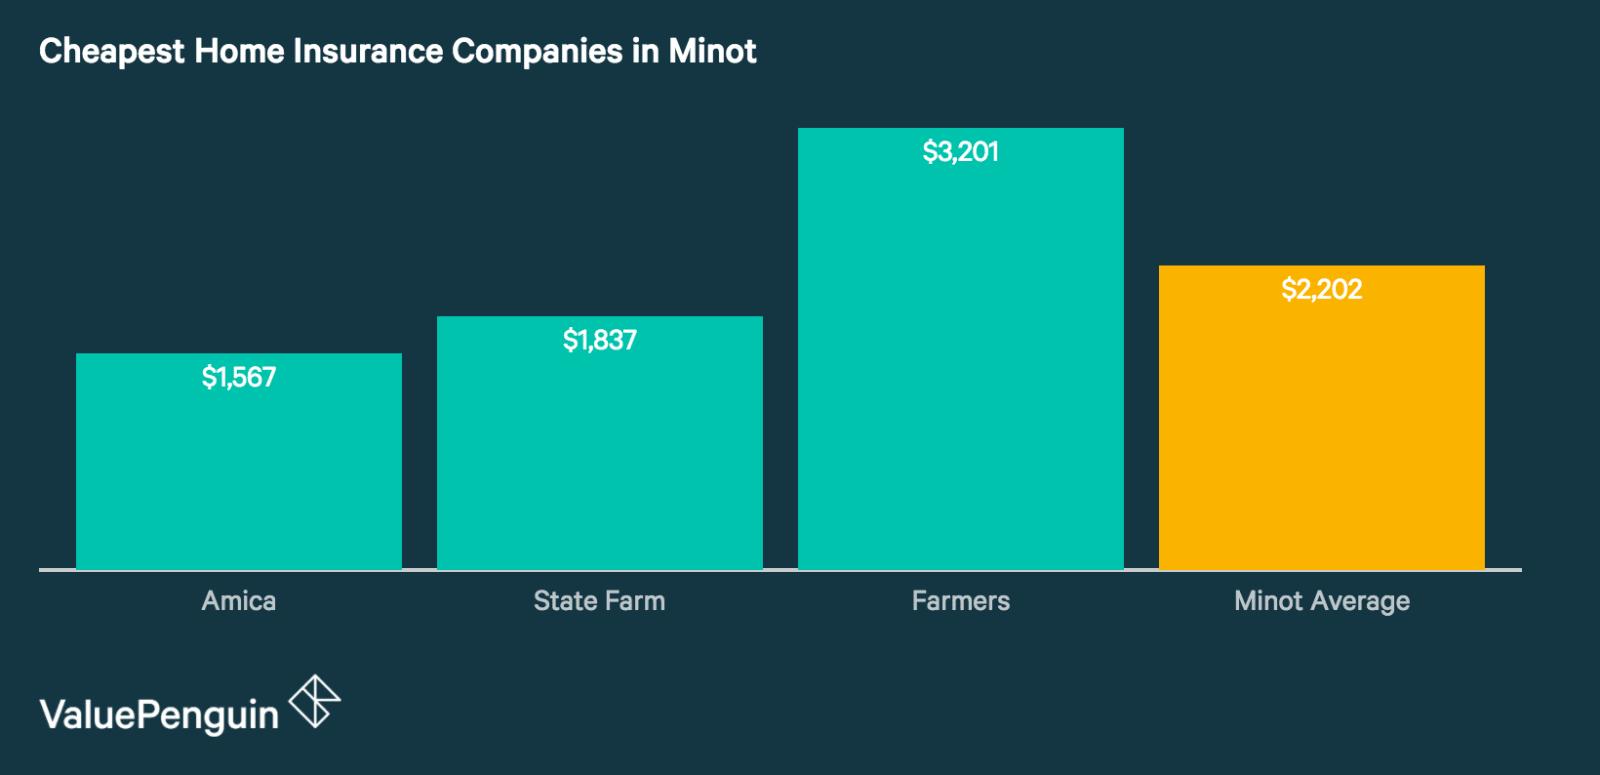 Minot's Best Home Insurance Companies